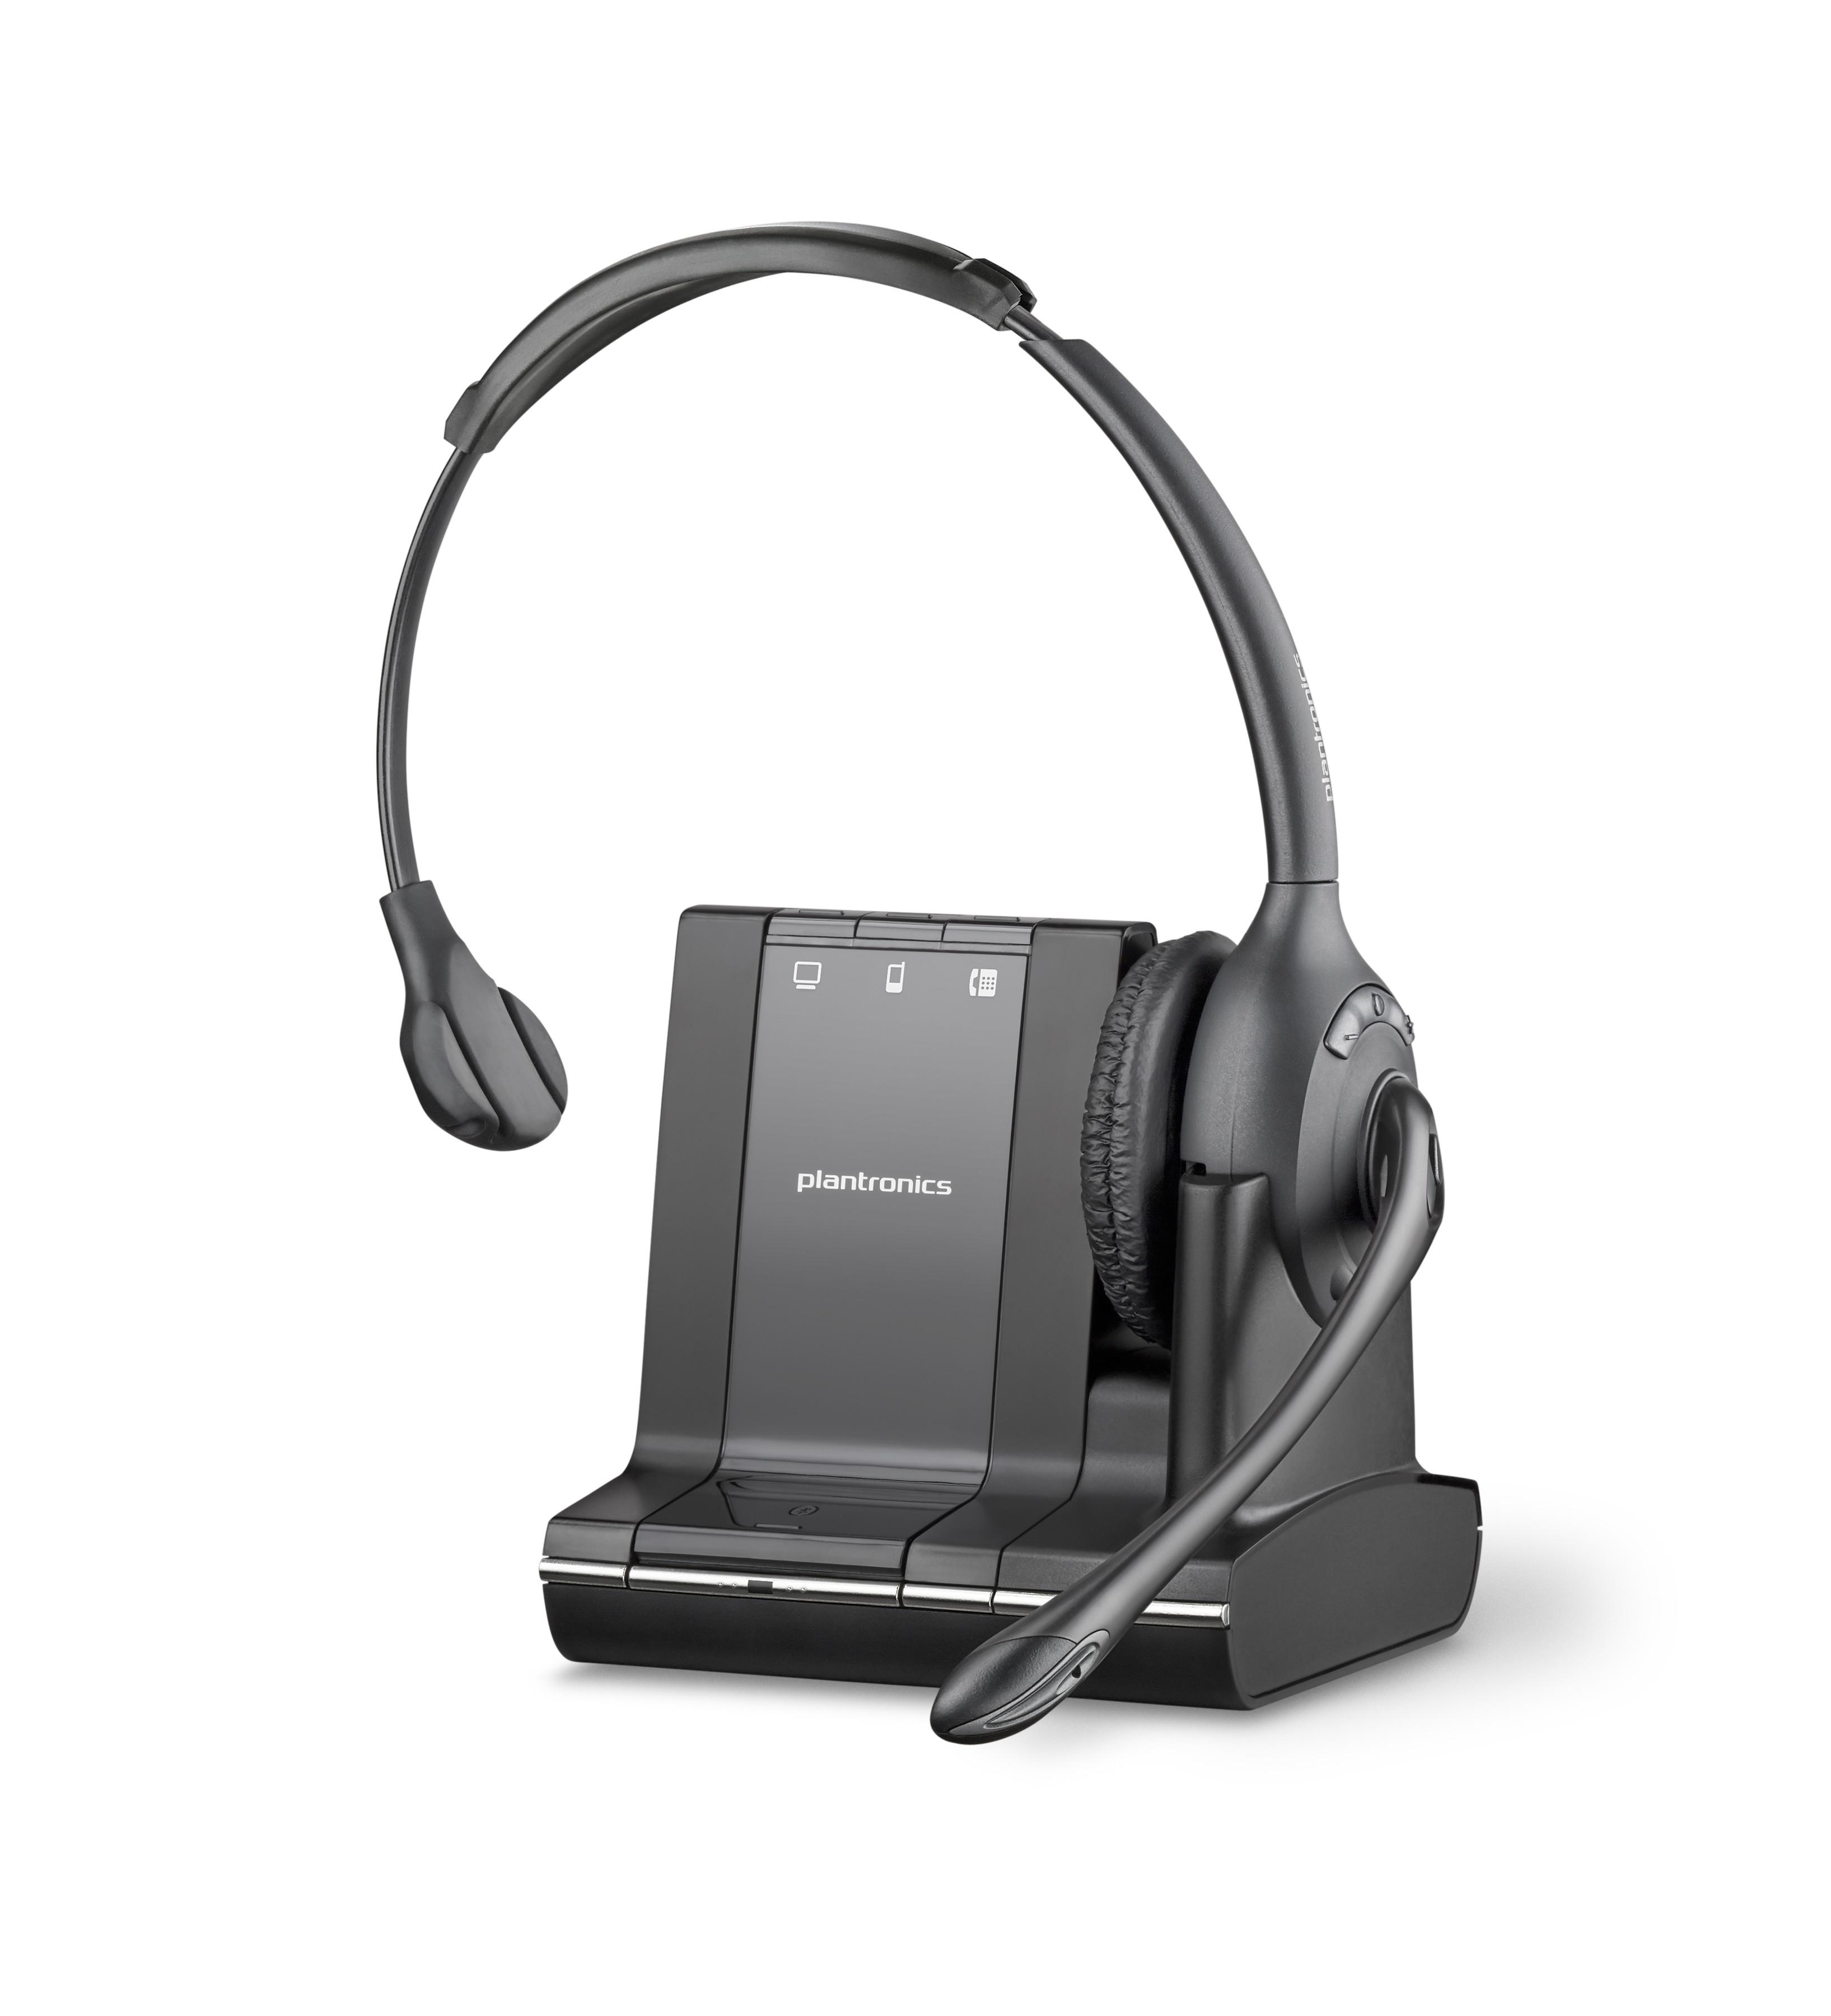 Plantronics Savi Office W710 Cordless Headset For PC, Desk Phone & Mobile